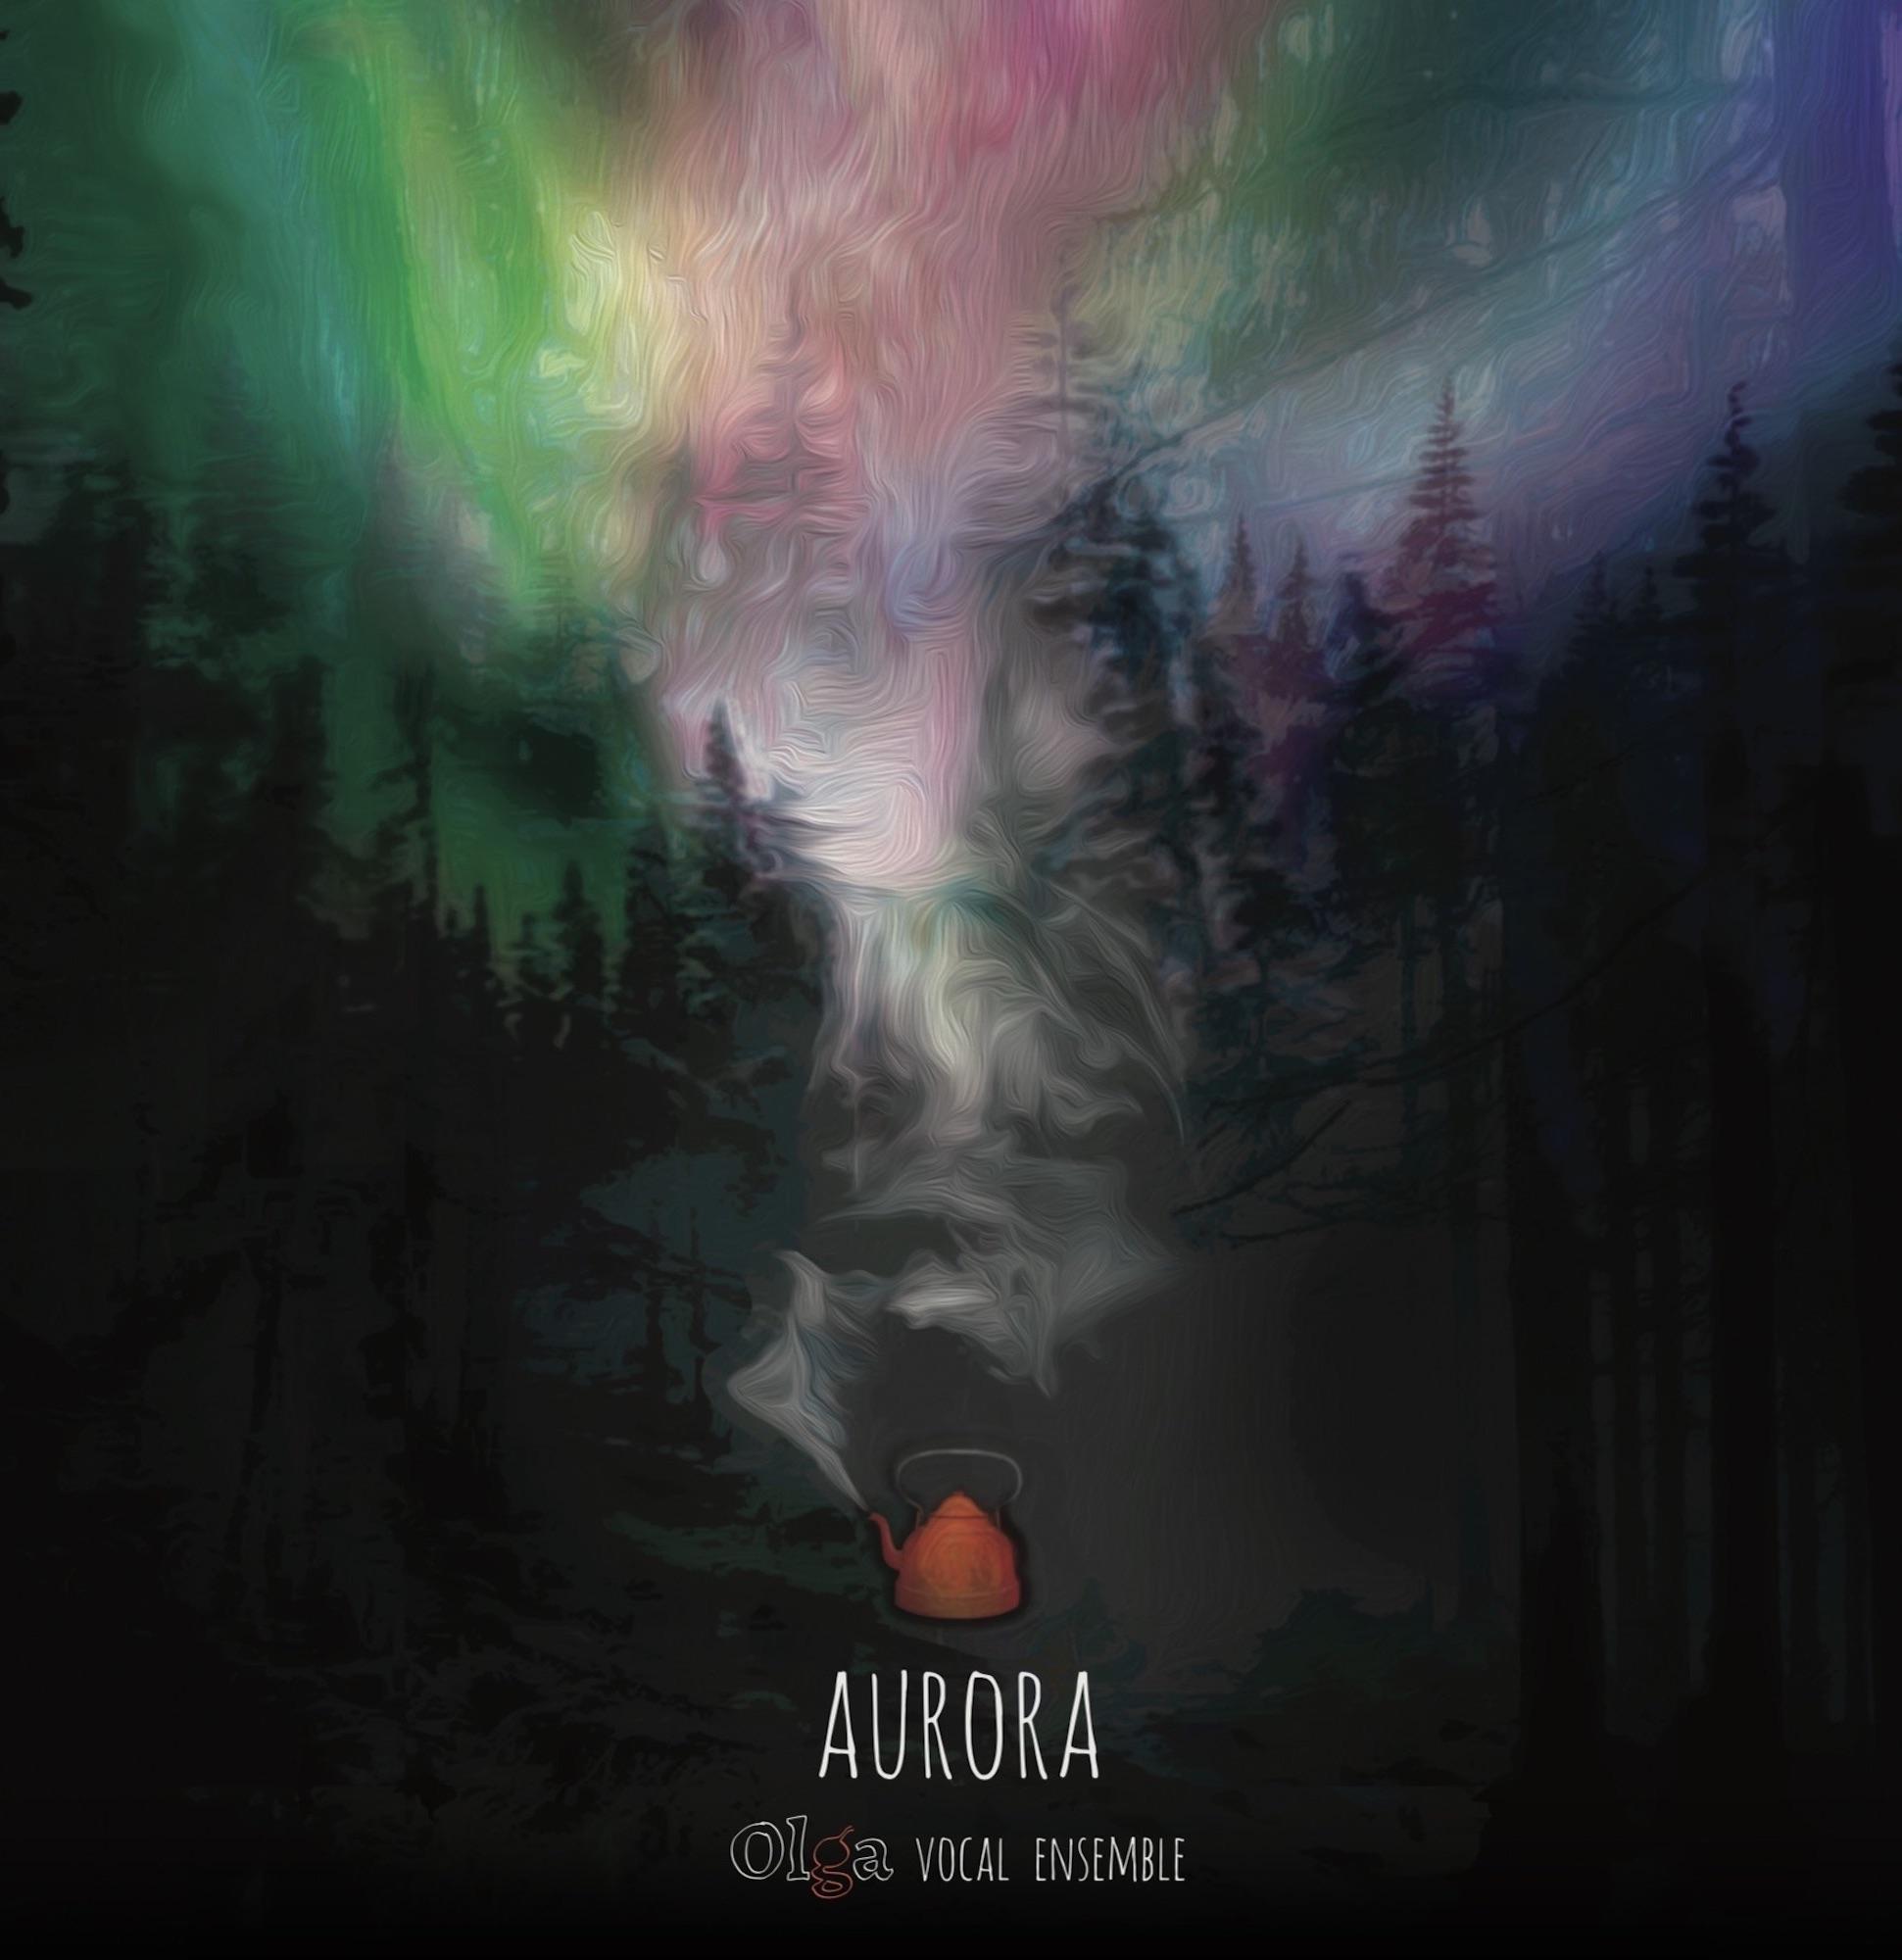 AURORA_album_art.jpg